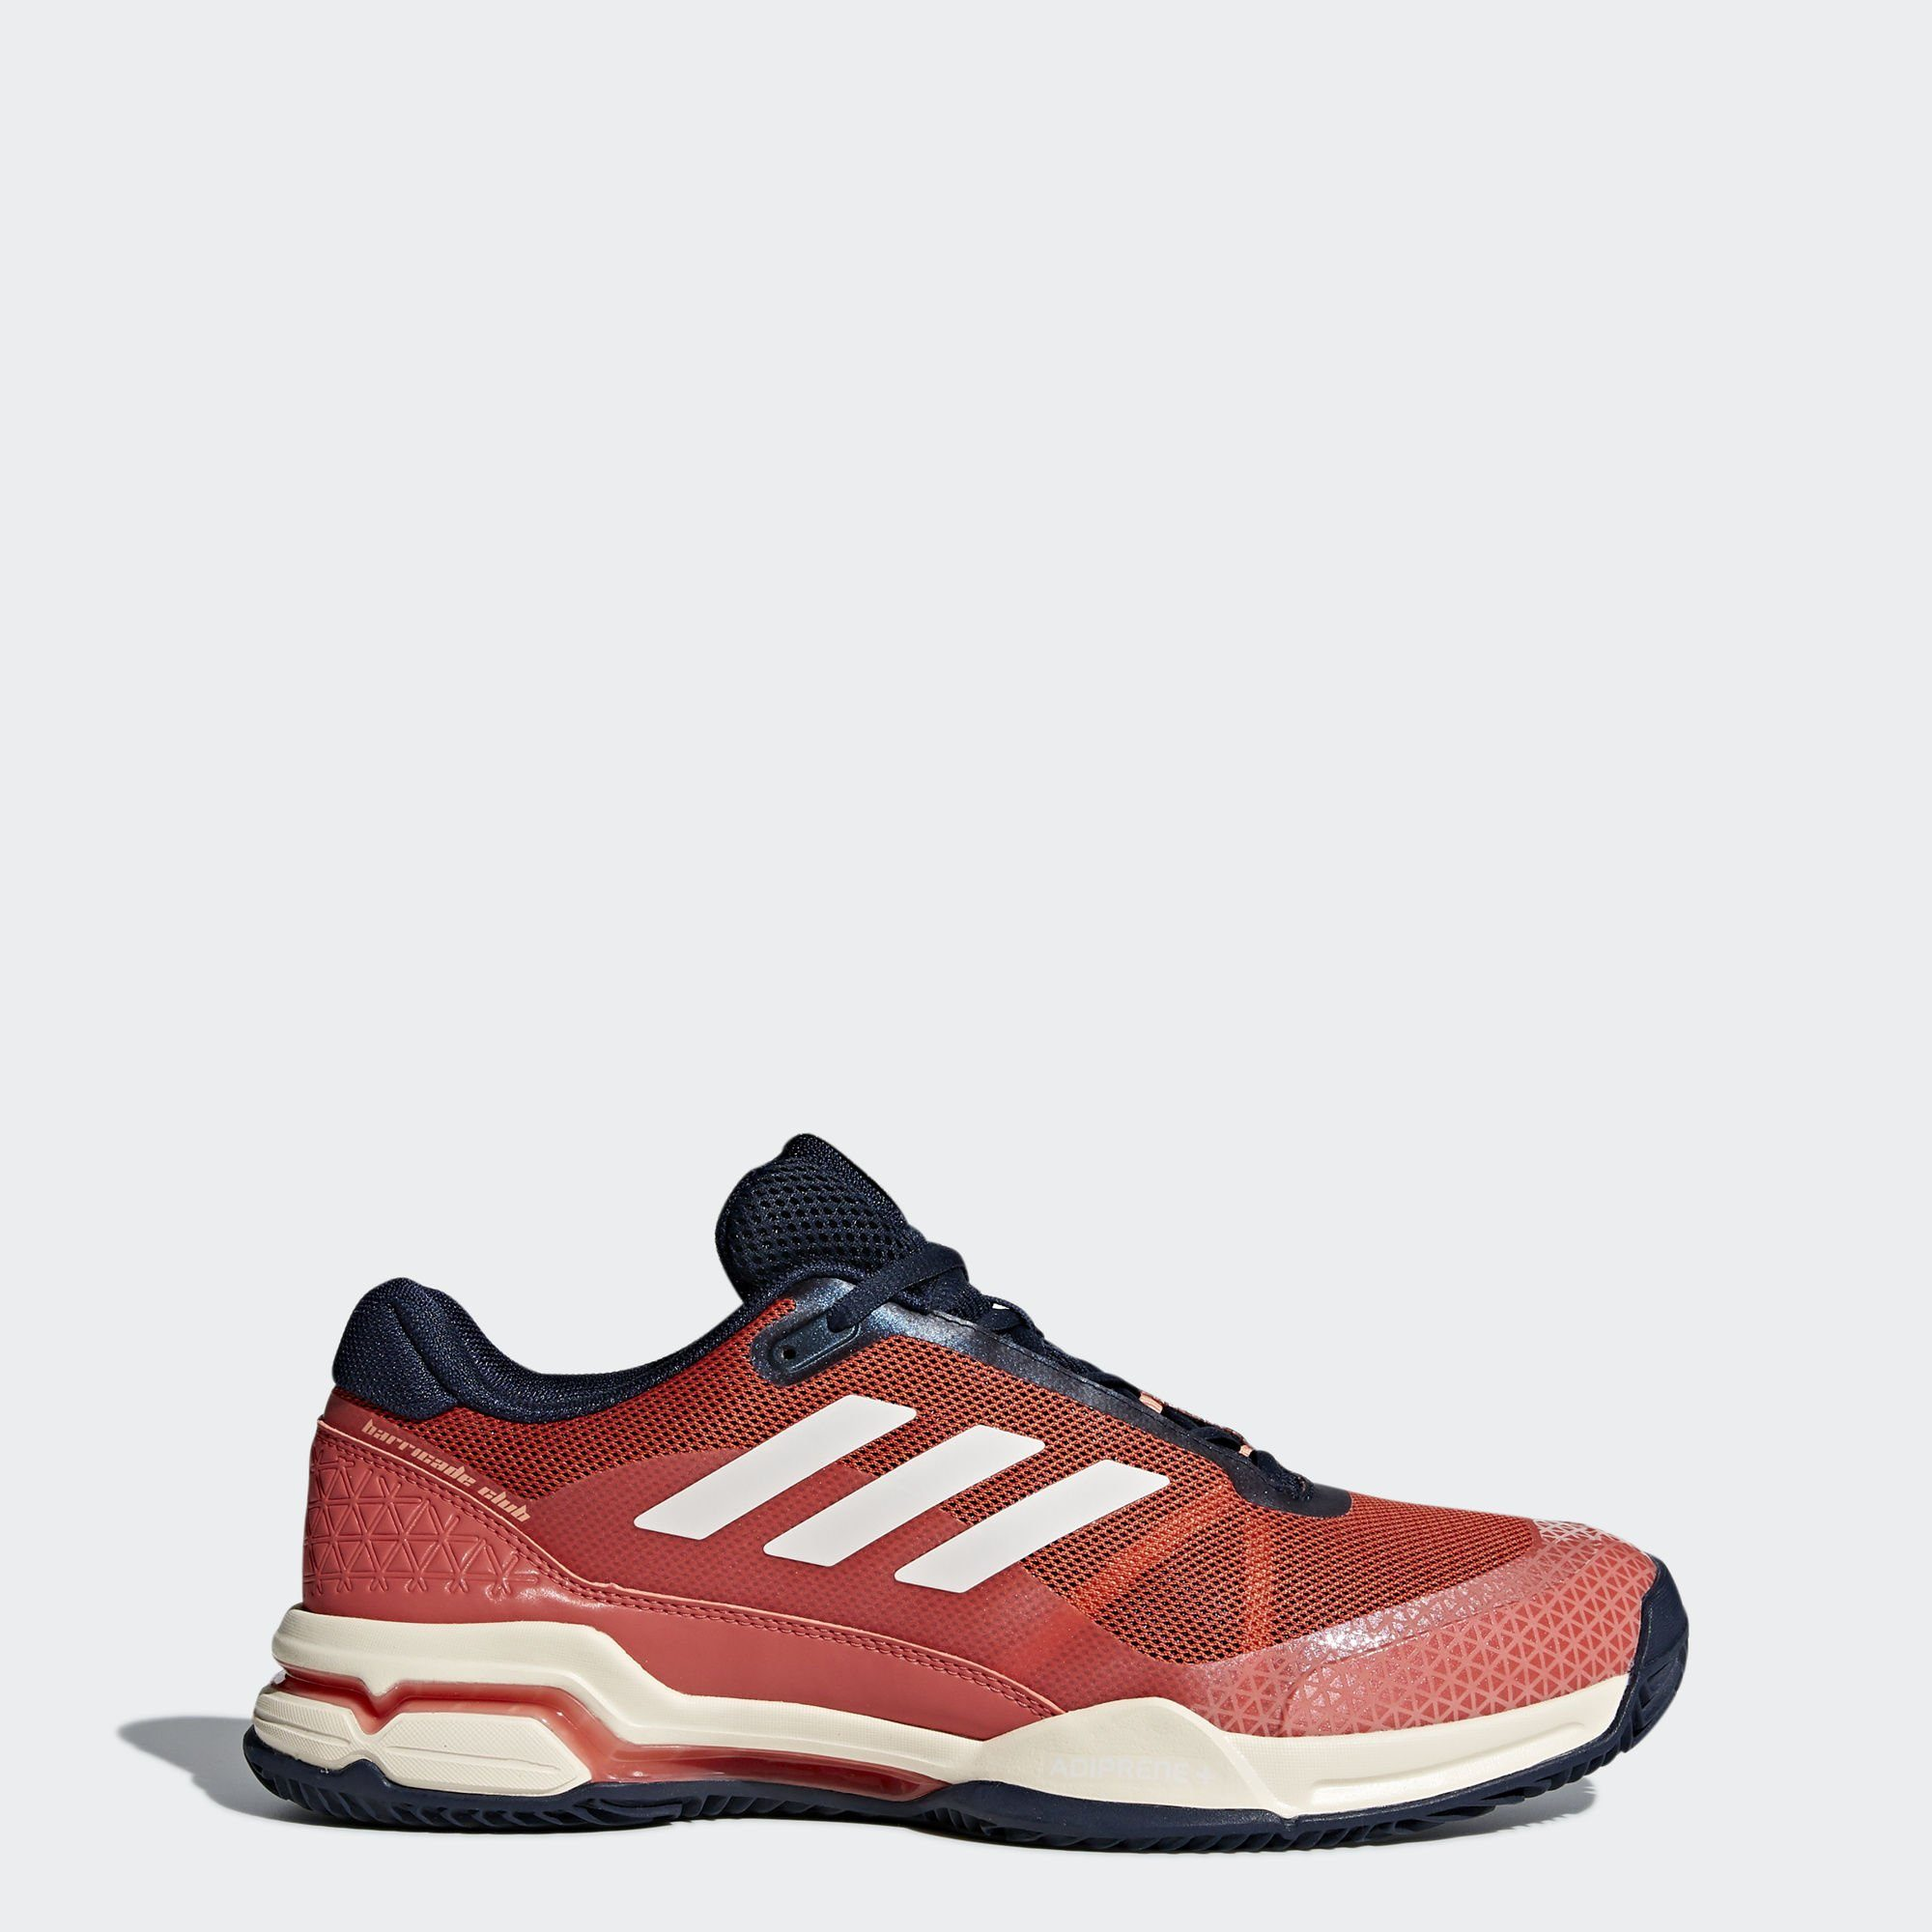 adidas Performance Barricade Club Clay Schuh Tennisschuh online kaufen  navy